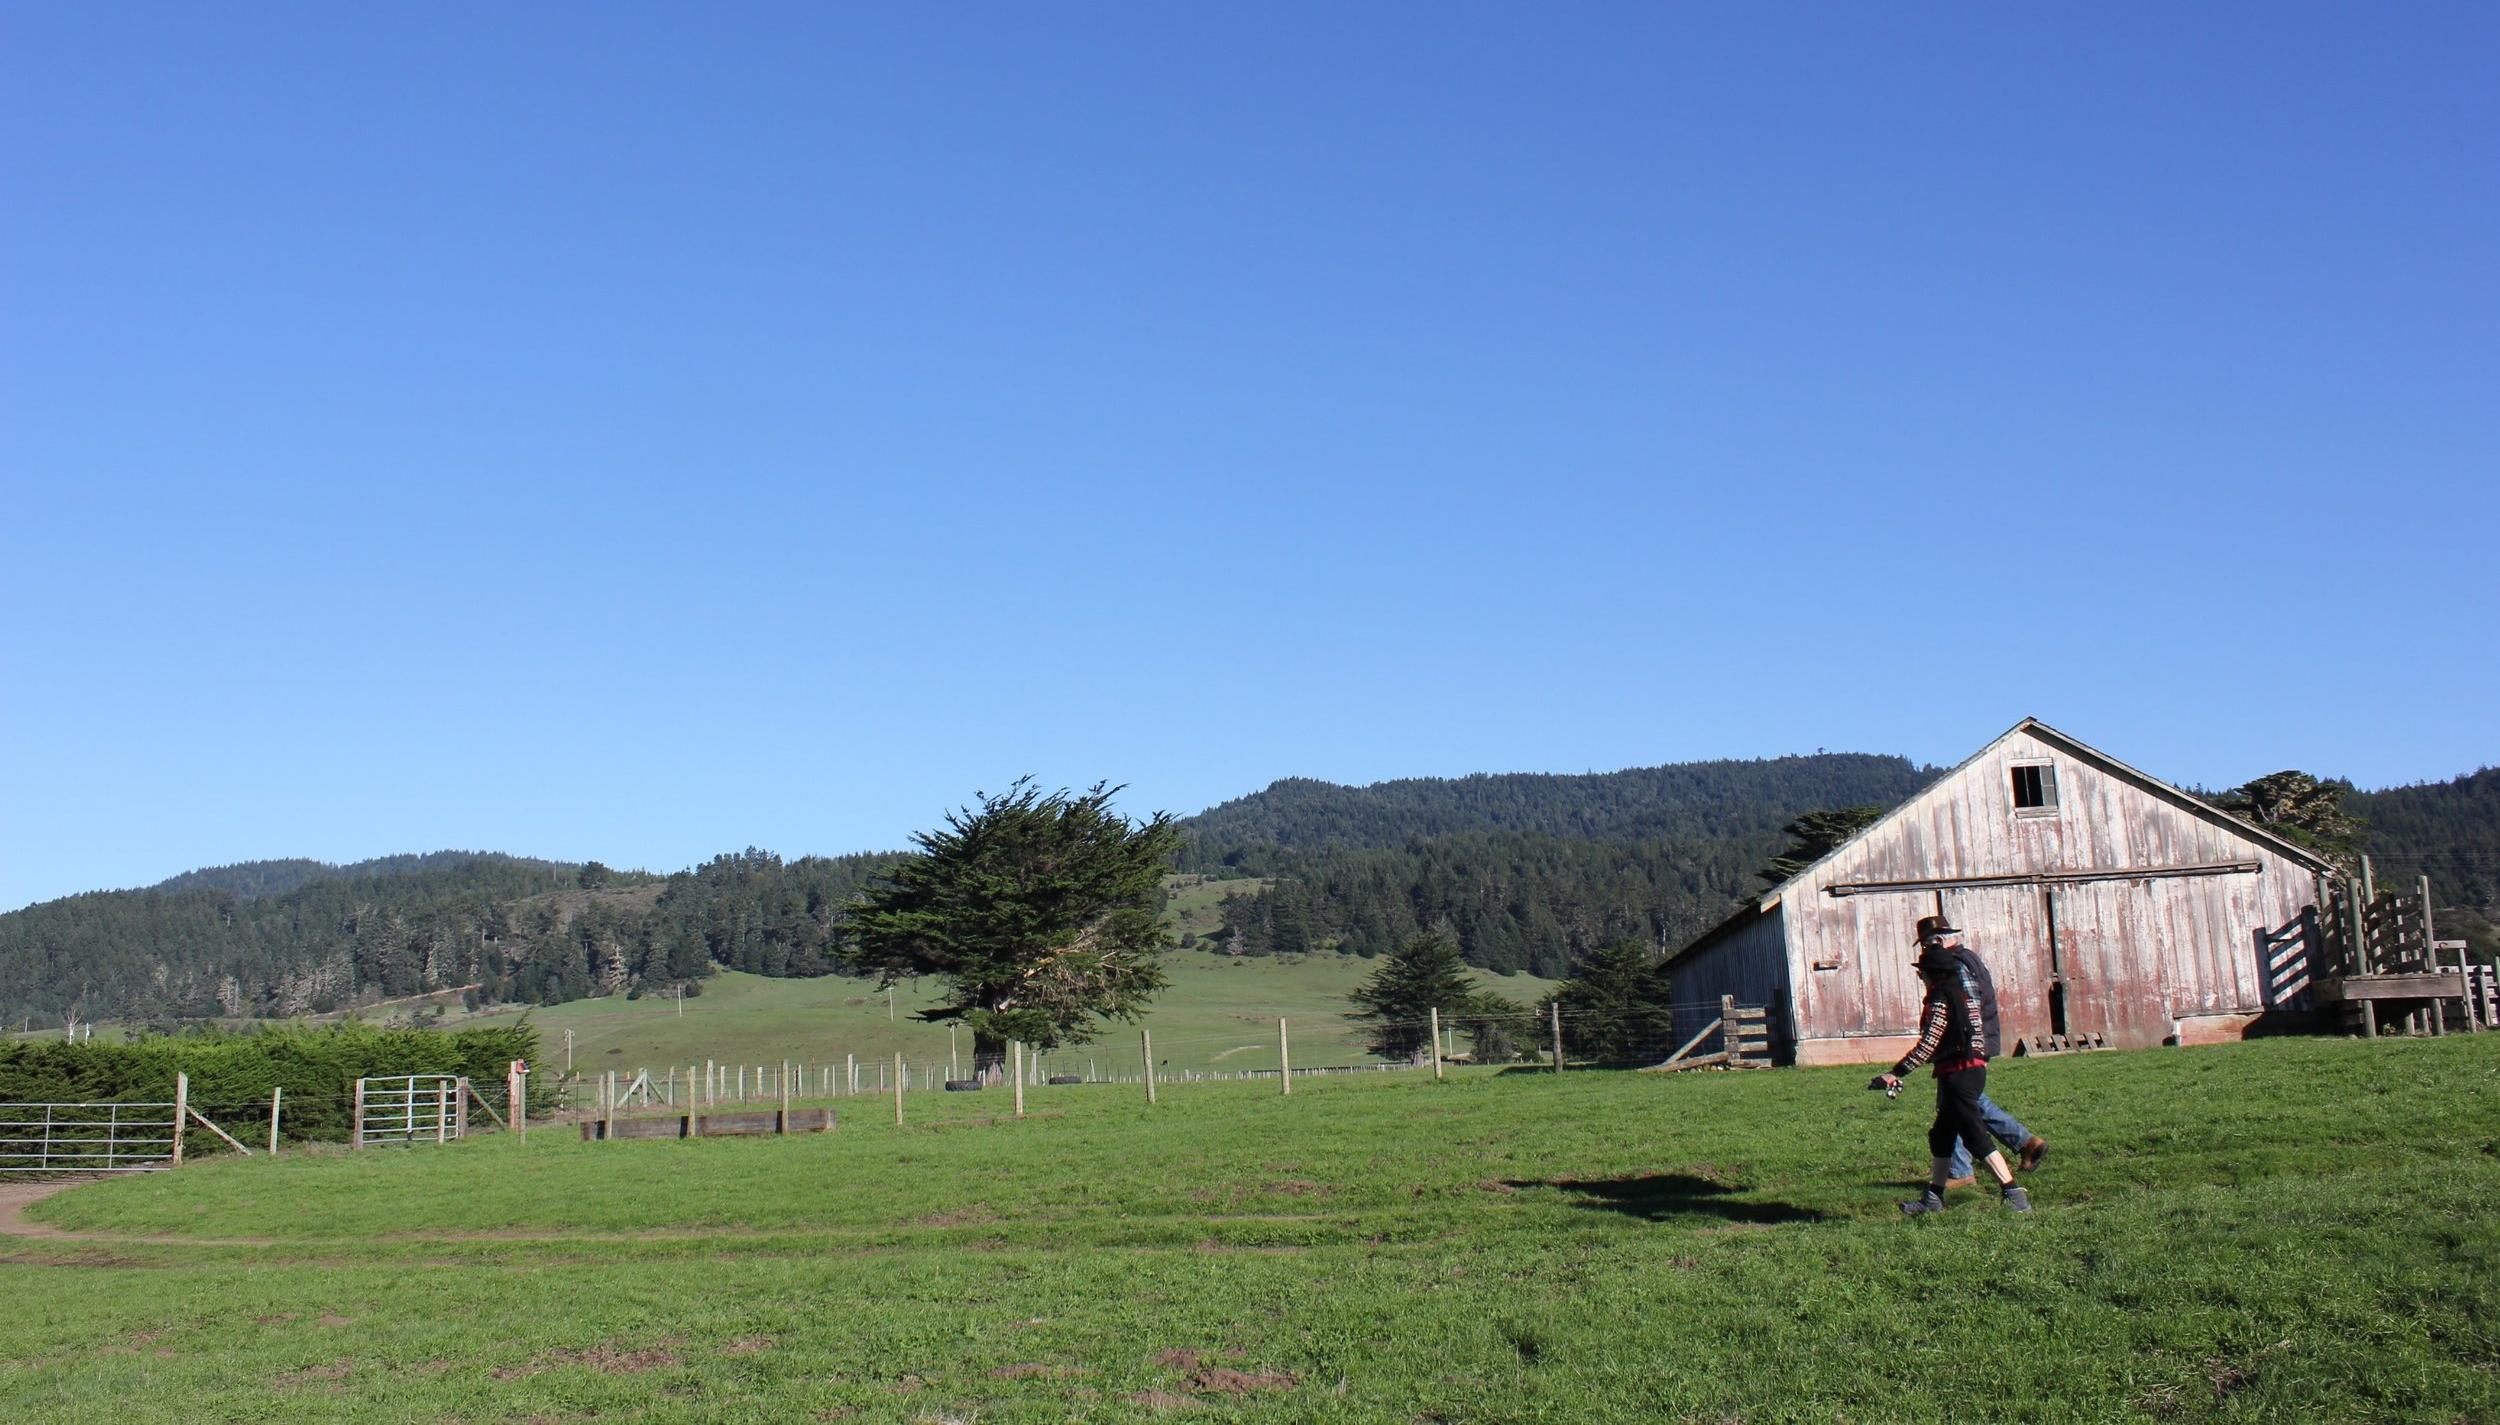 farm with people walking.jpg